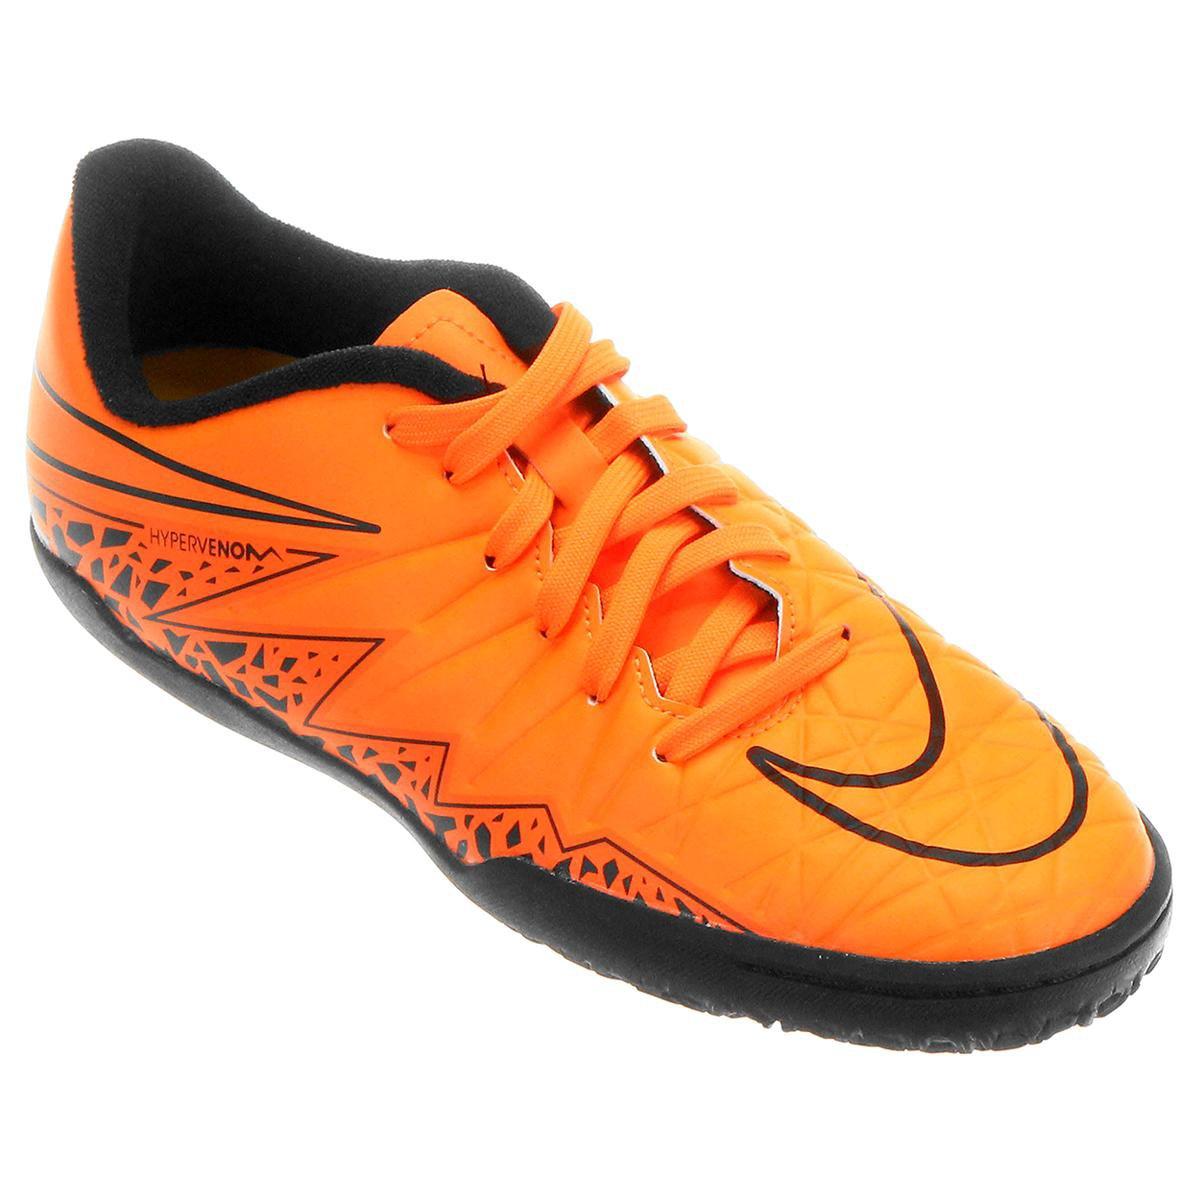 2c915fd71112c ... get o produto chuteira futsal infantil nike hypervenom phelon 2 ic  laranja e preto acabou.